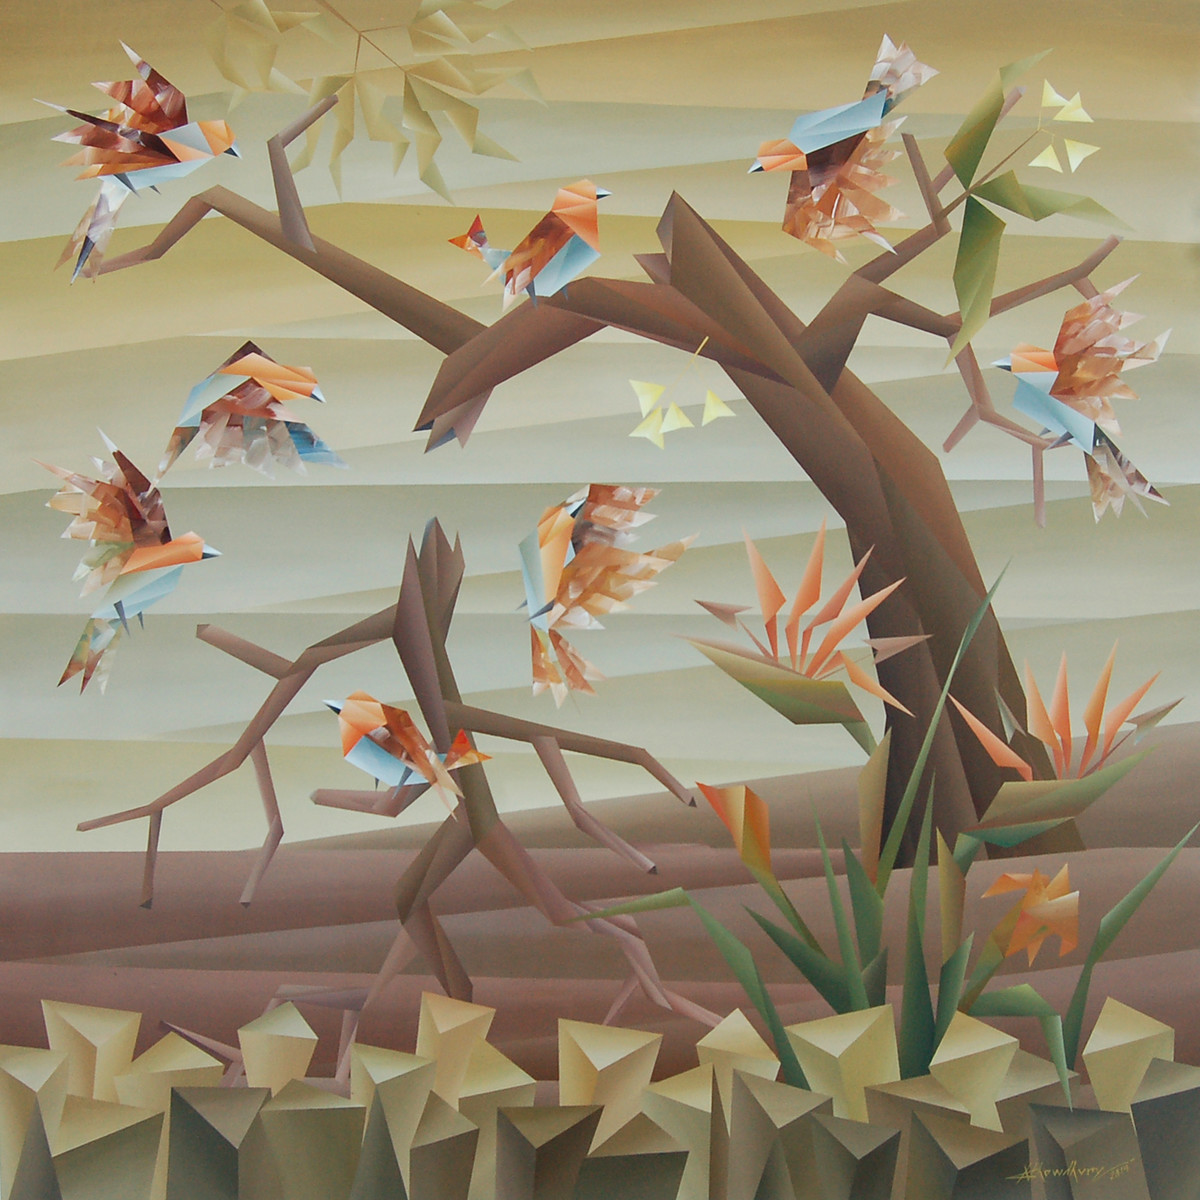 wedding by Nirakar Chowdhury, Expressionism Painting, Acrylic on Canvas, Pale Oyster color